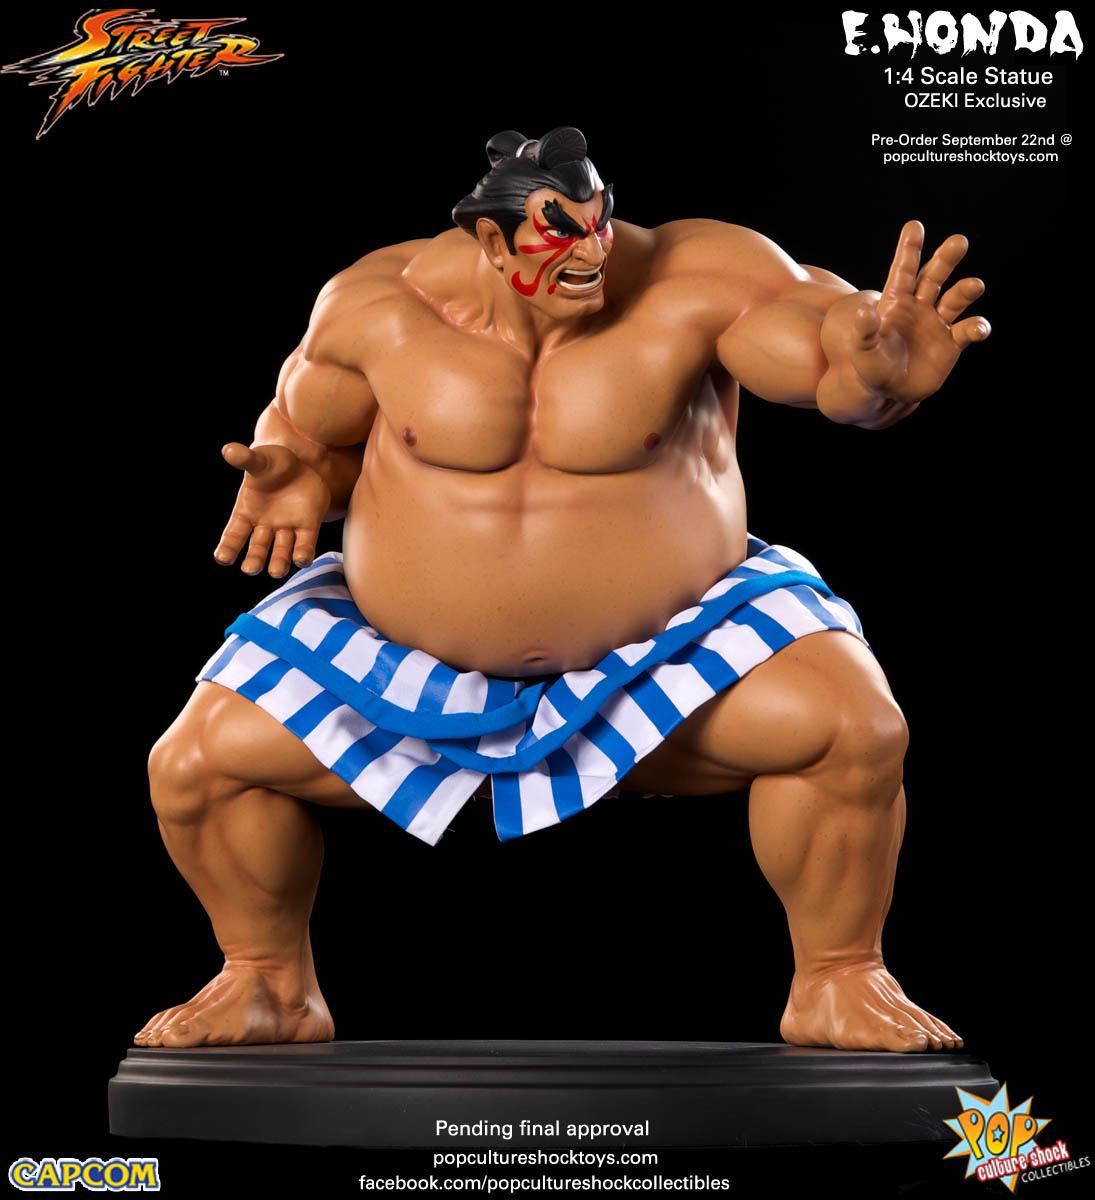 [Pop Culture Shock] Street Fighter: E. Honda 1/4 Statue - Página 3 Street-Fighter-E.-Honda-ozeki-Statue-005